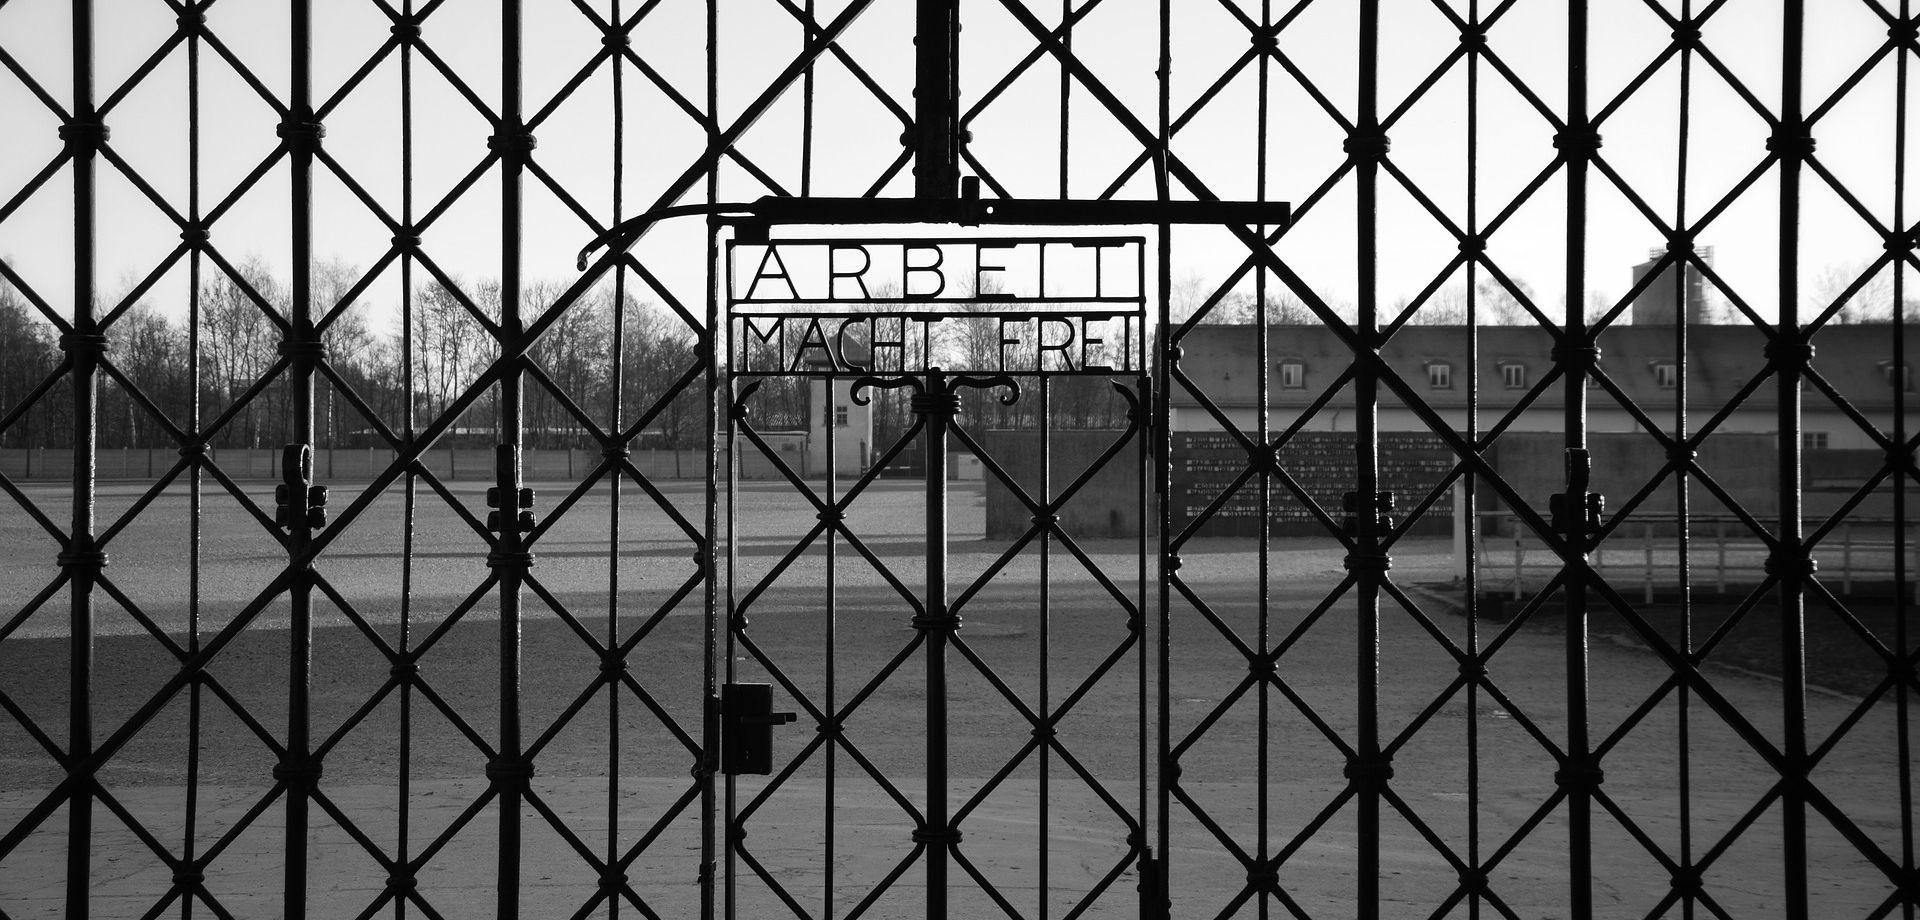 'ARBEIT MACHT FREI' Ukradena vrata iz Dachaua pronađena u Norveškoj